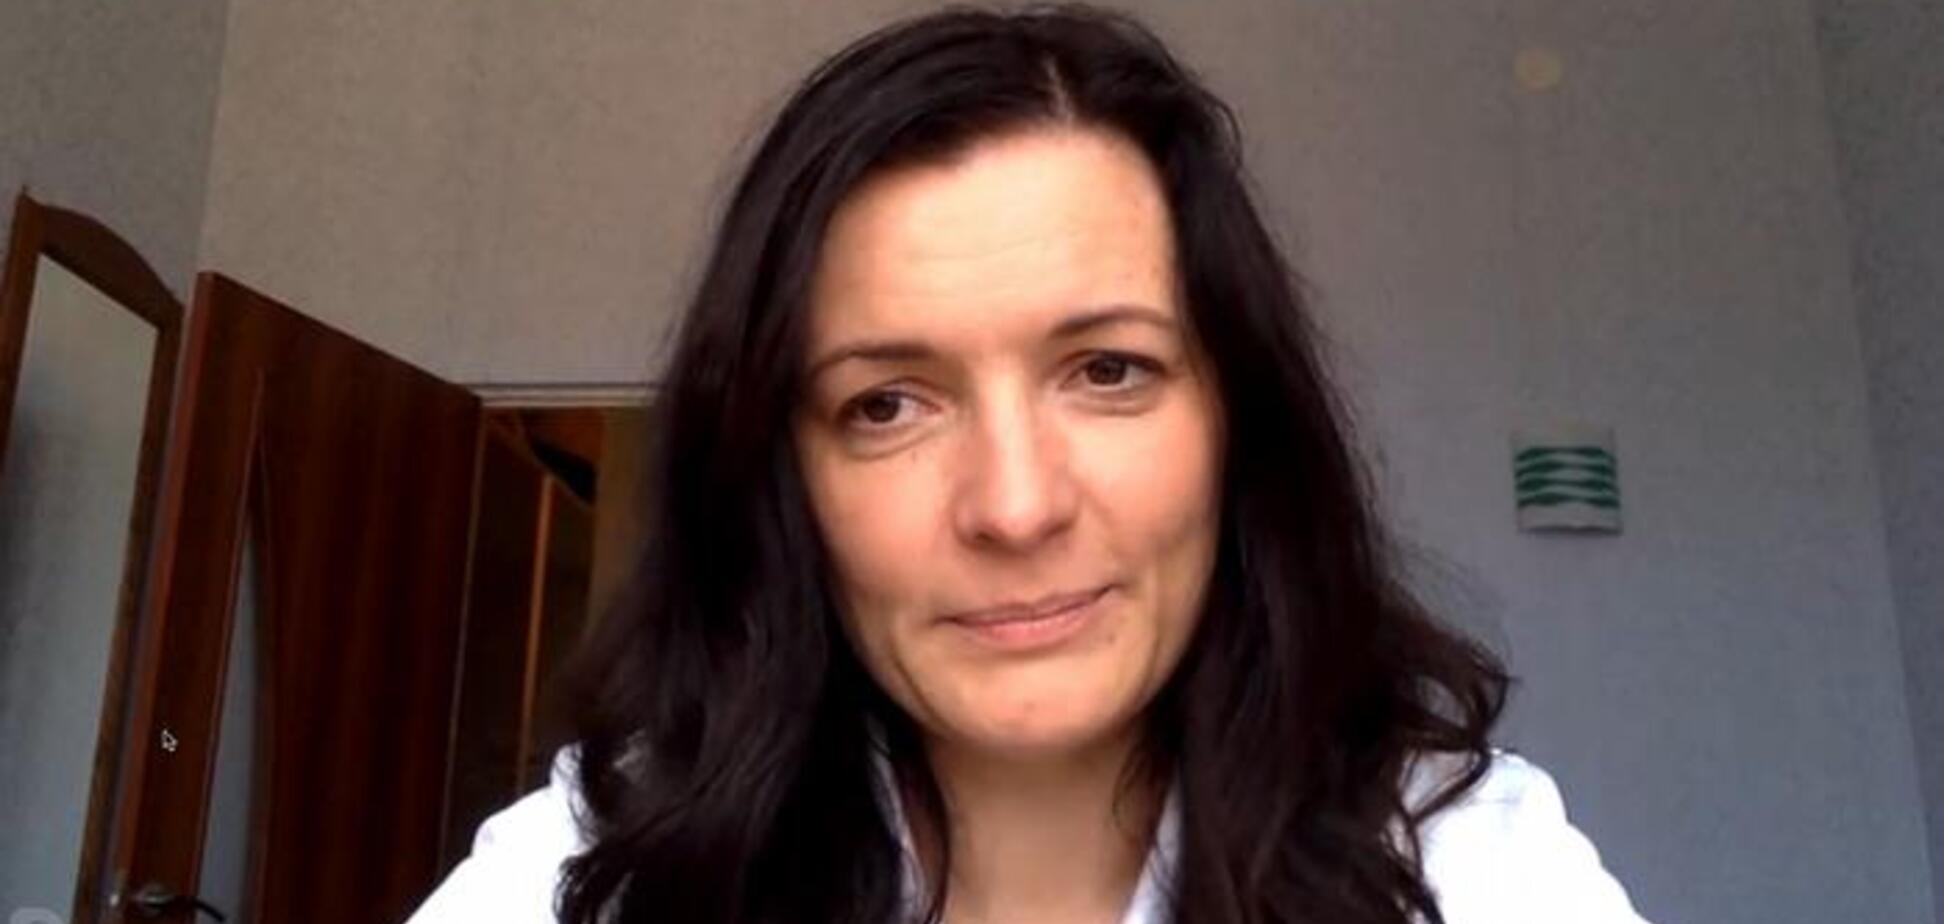 Скалецкая дала советы украинцам, как не заболеть коронавирусом